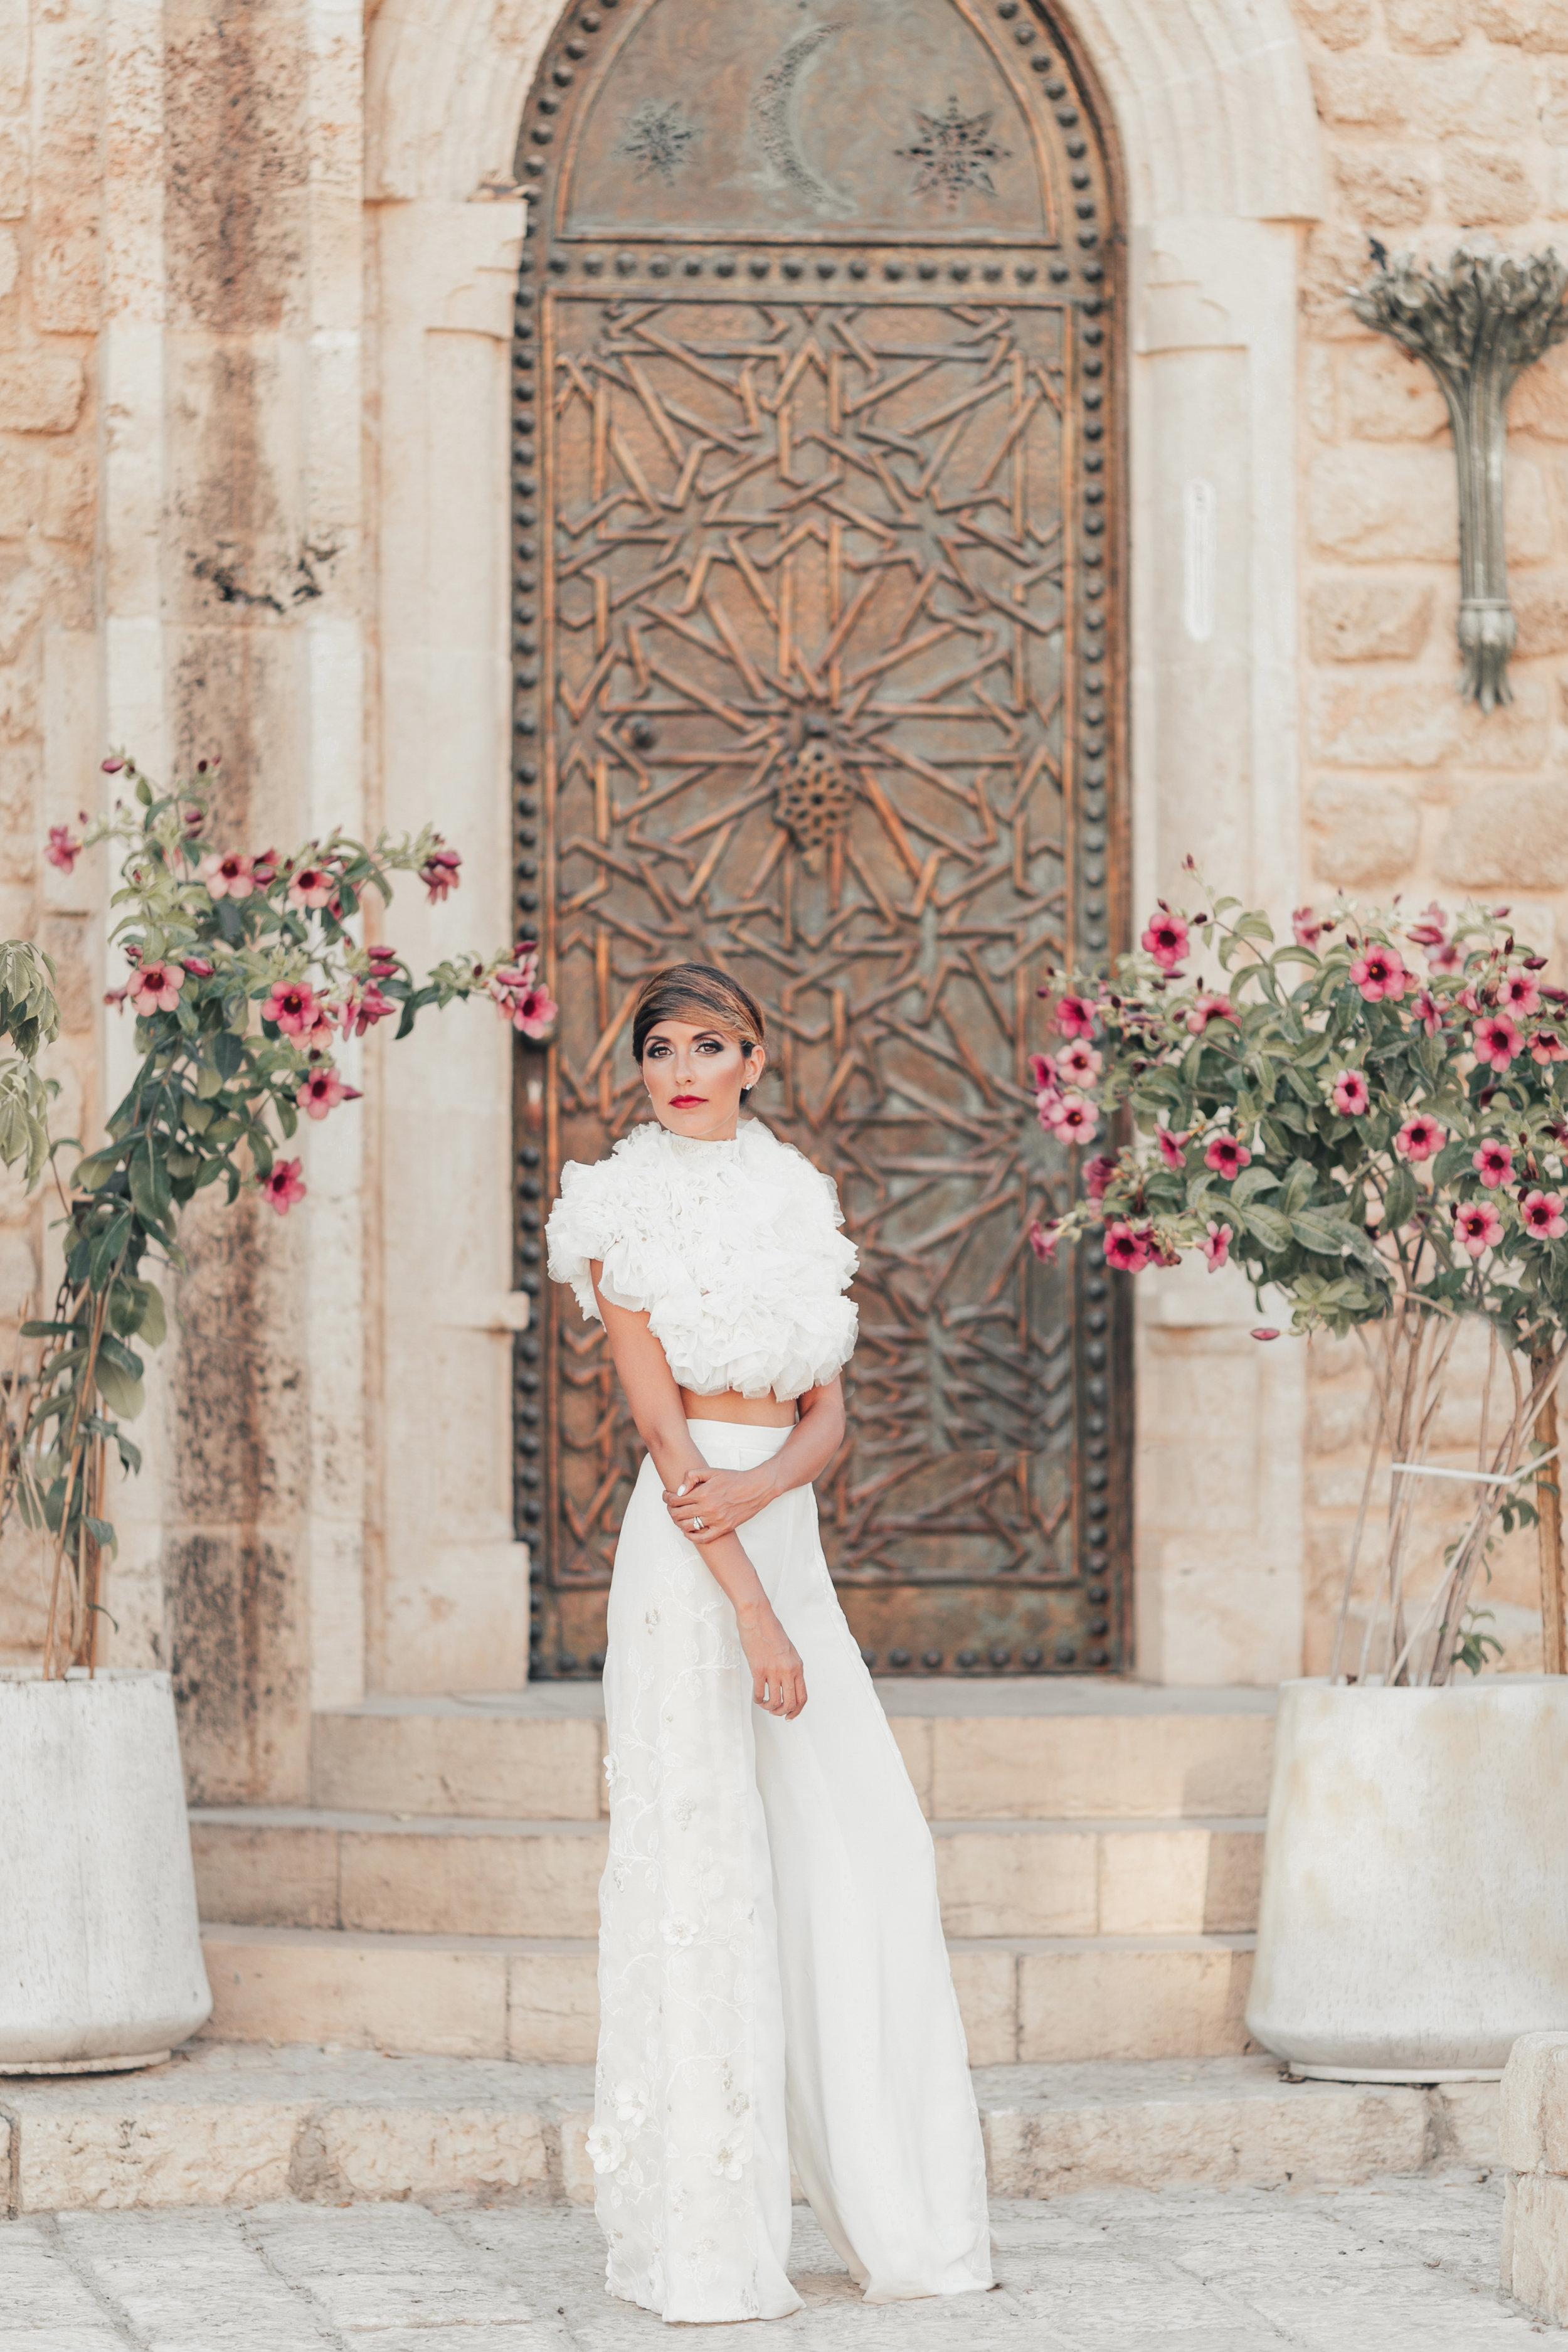 Anée Atelier Israel Nathalie Kraynina Bride 3